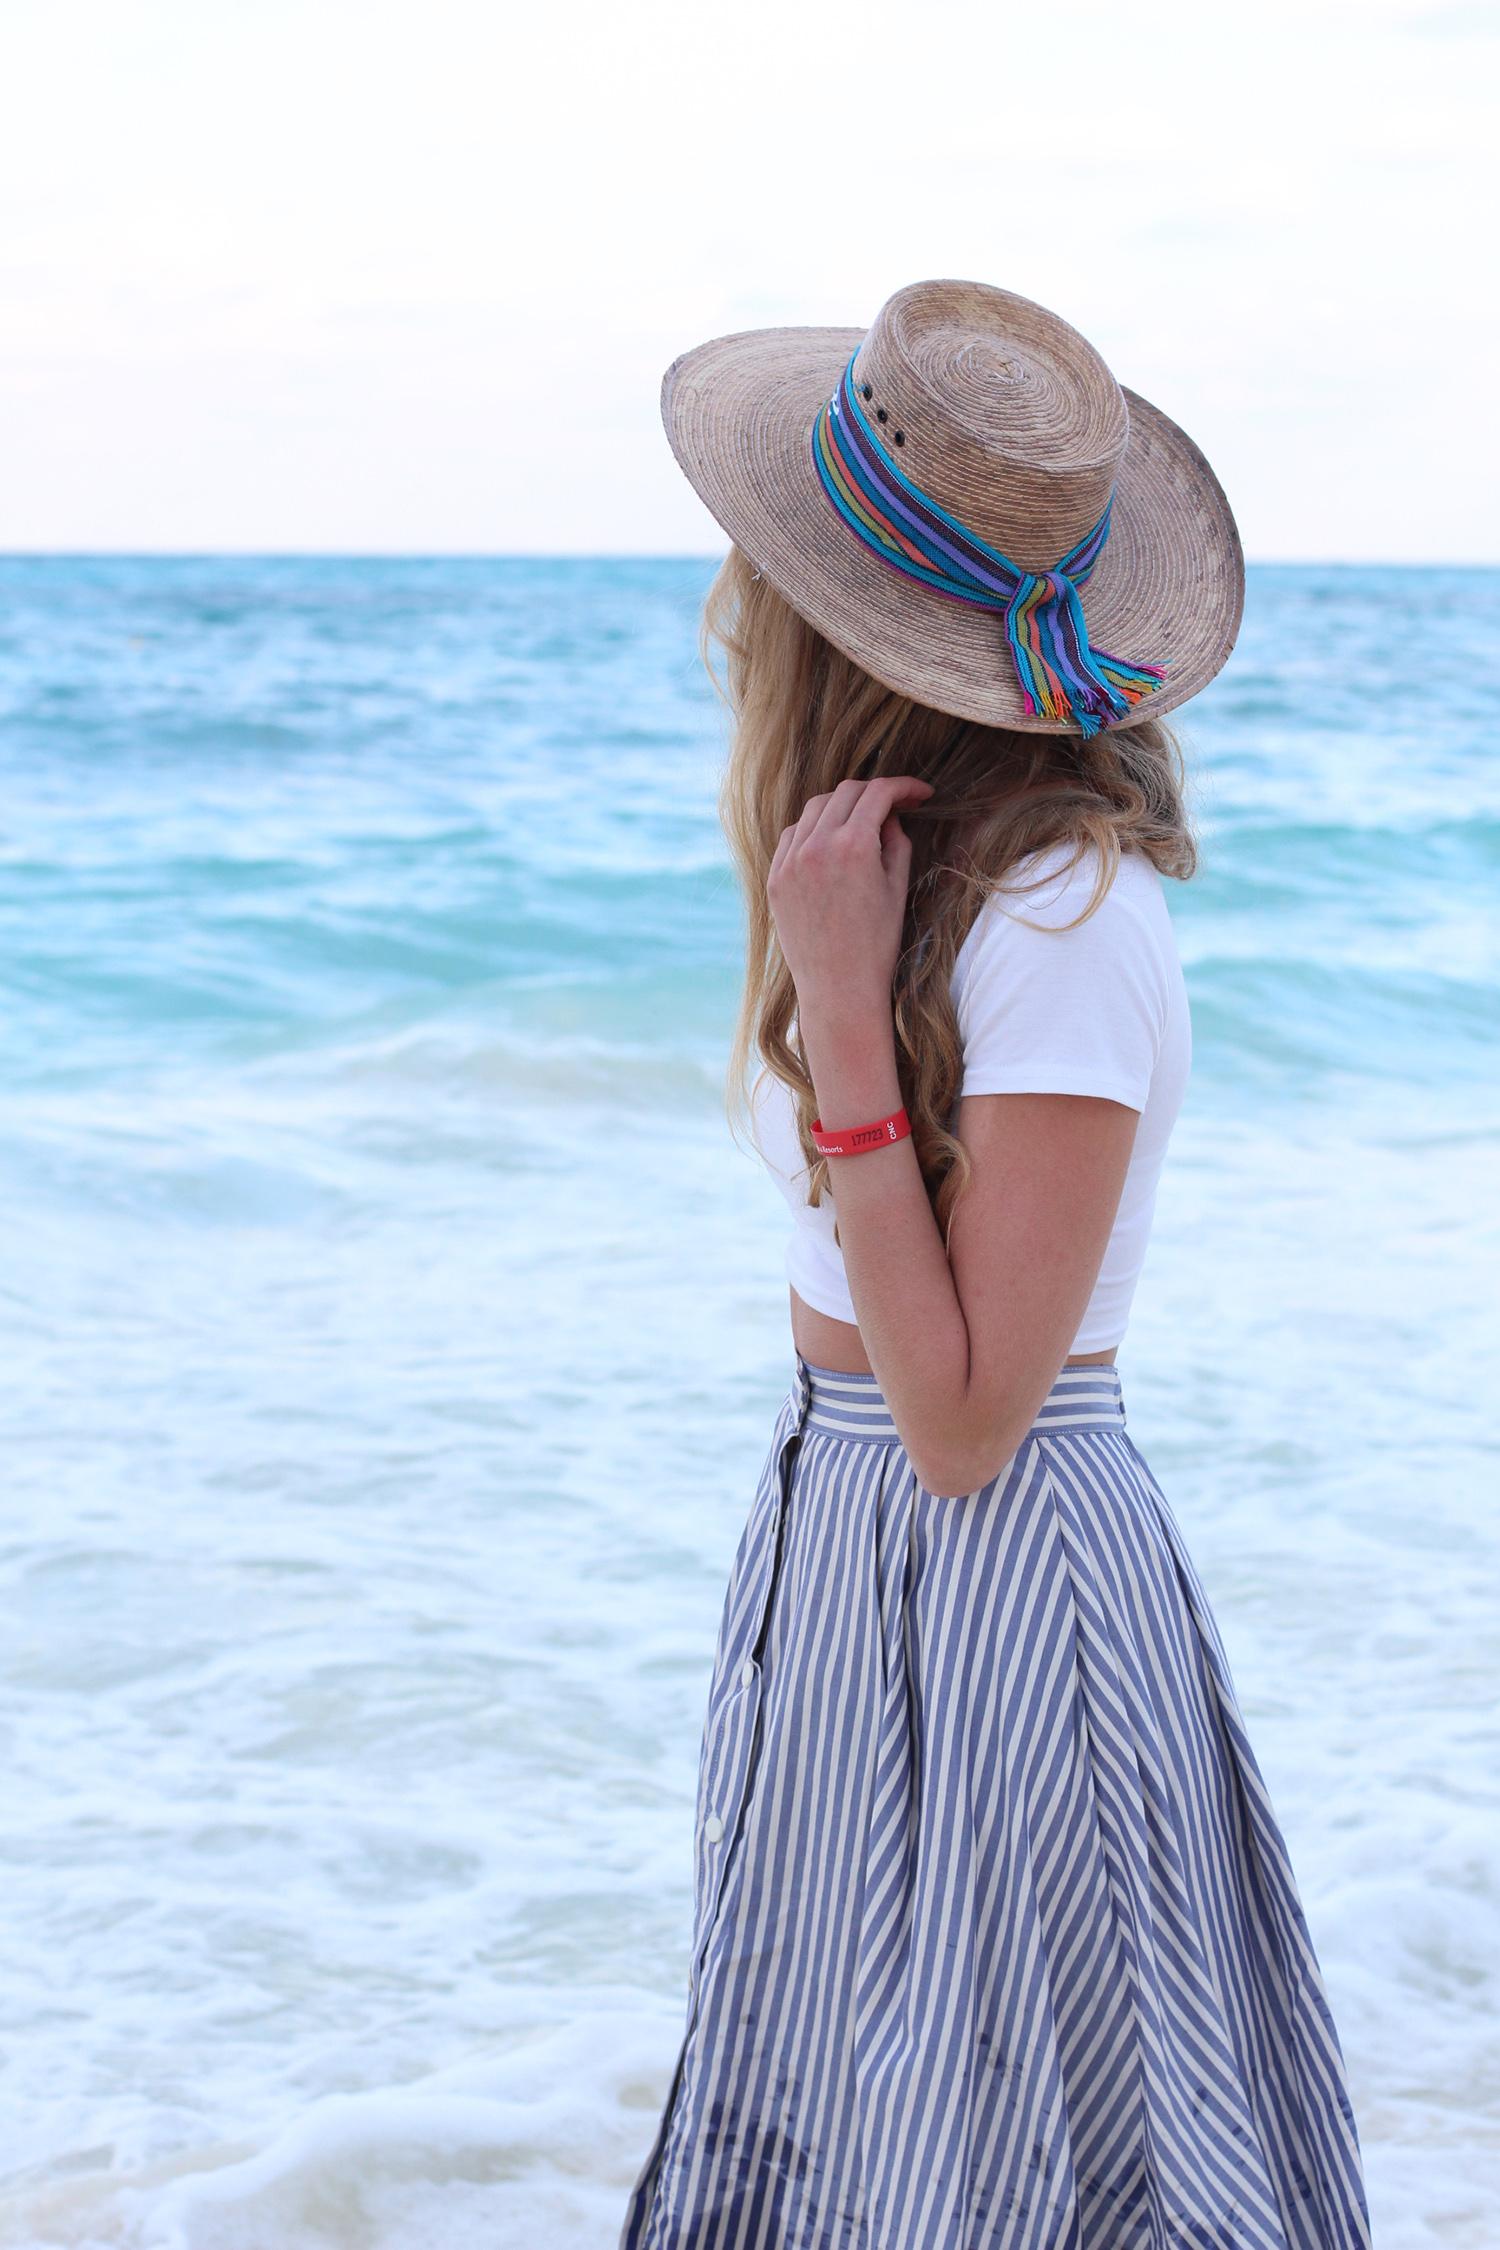 straw hat seersucker skirt